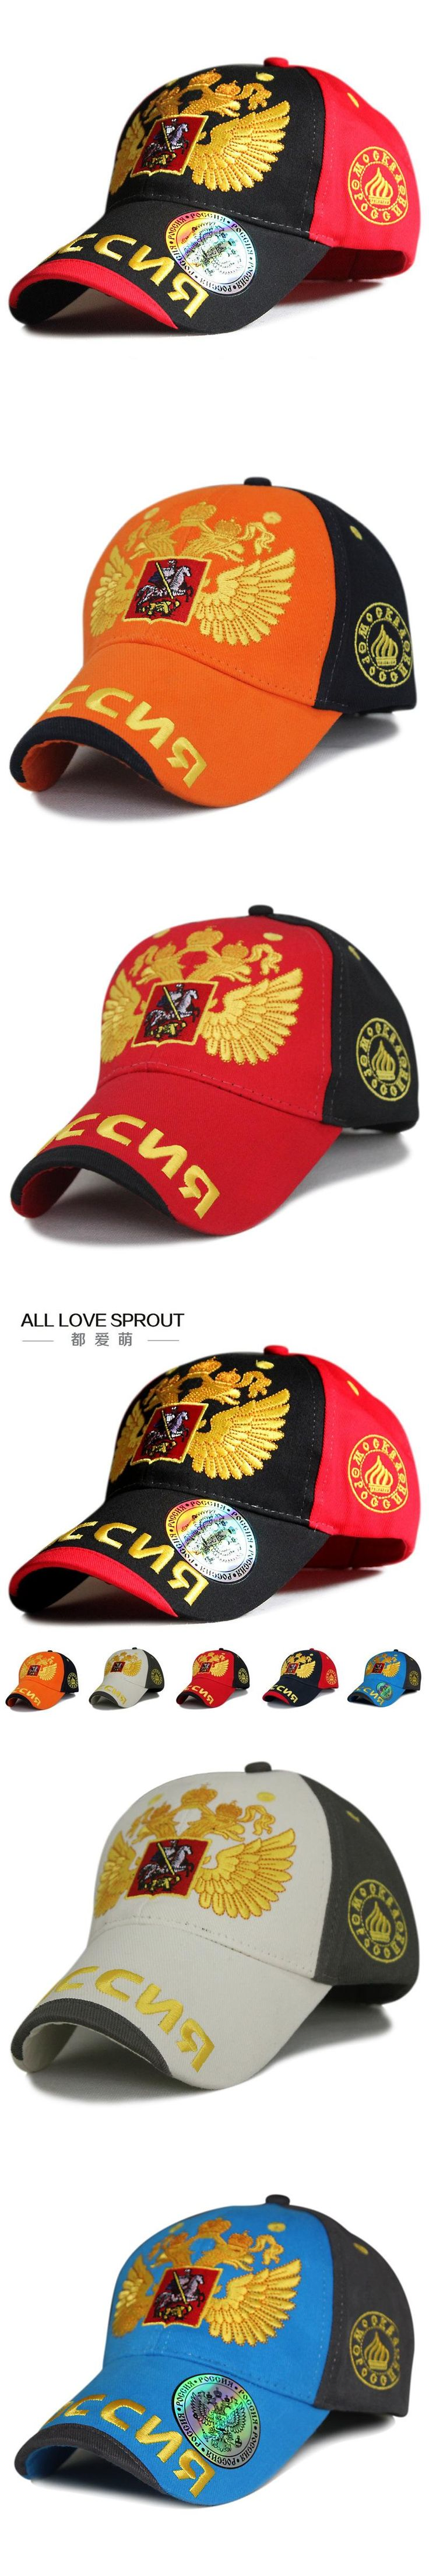 2016 Russian double headed eagle baseball cap Cotton Black fashion men caps peaked cap snapback hats